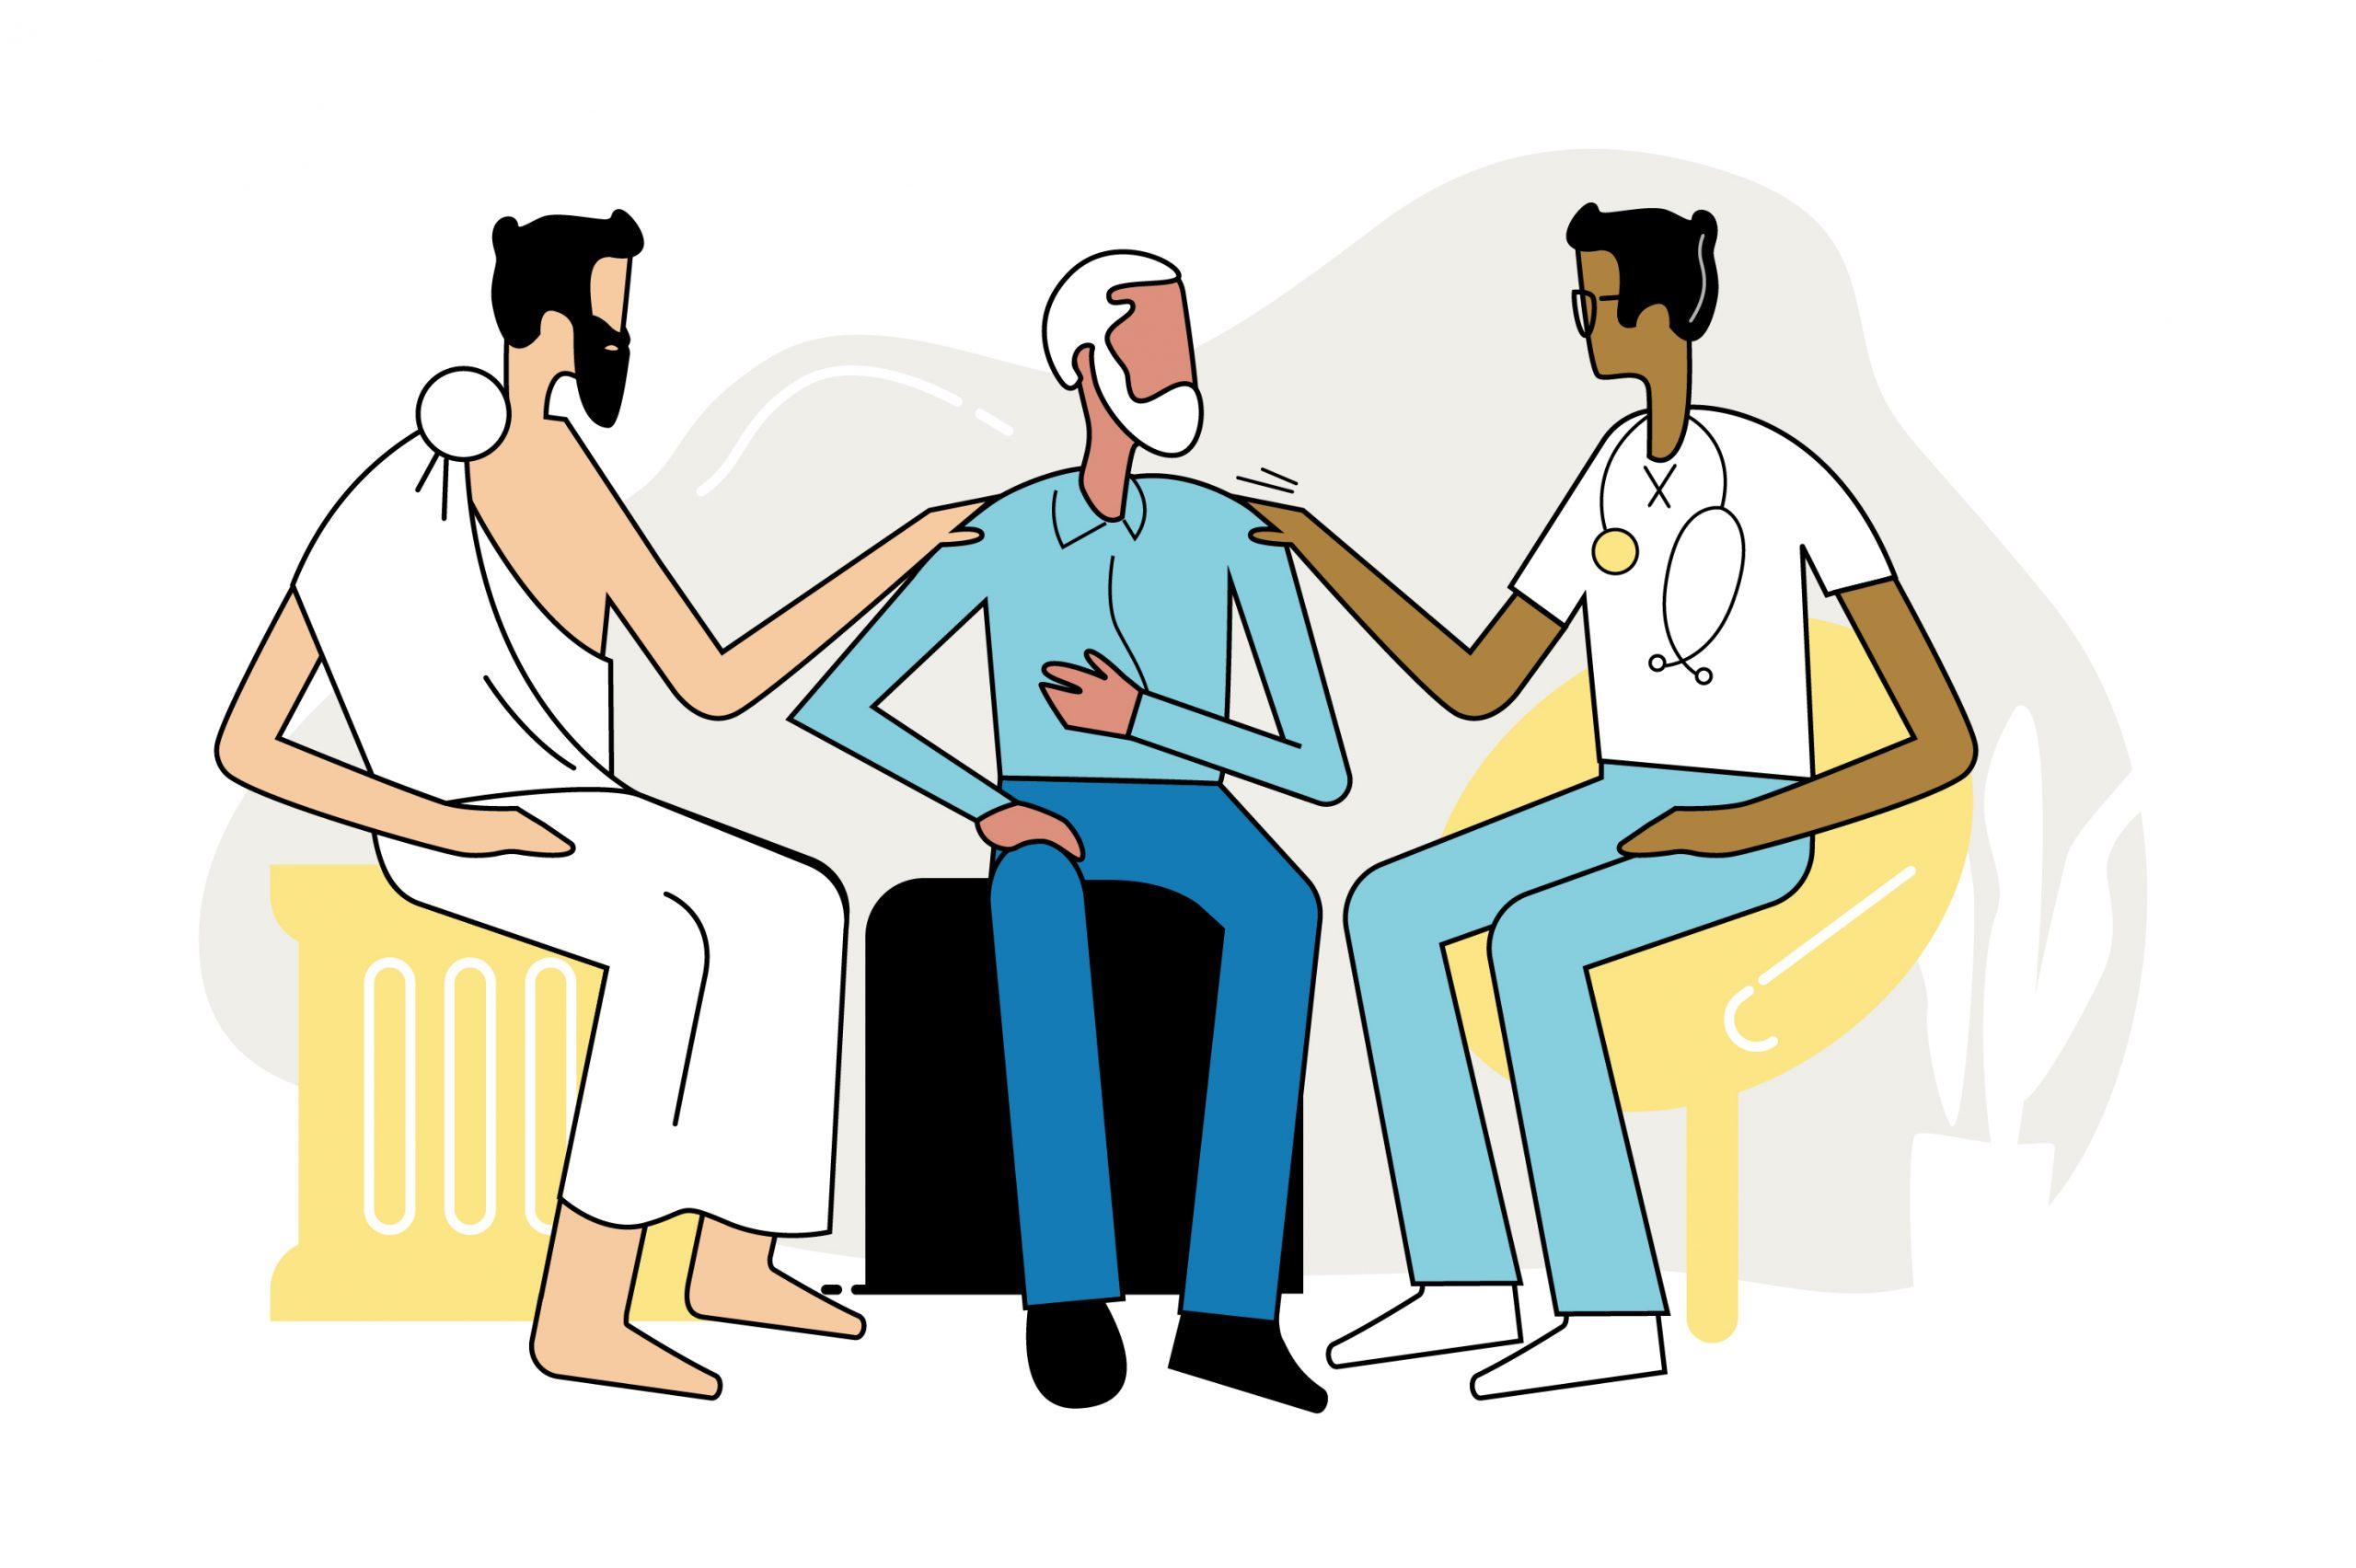 UME Hippocratic Oath Illustration